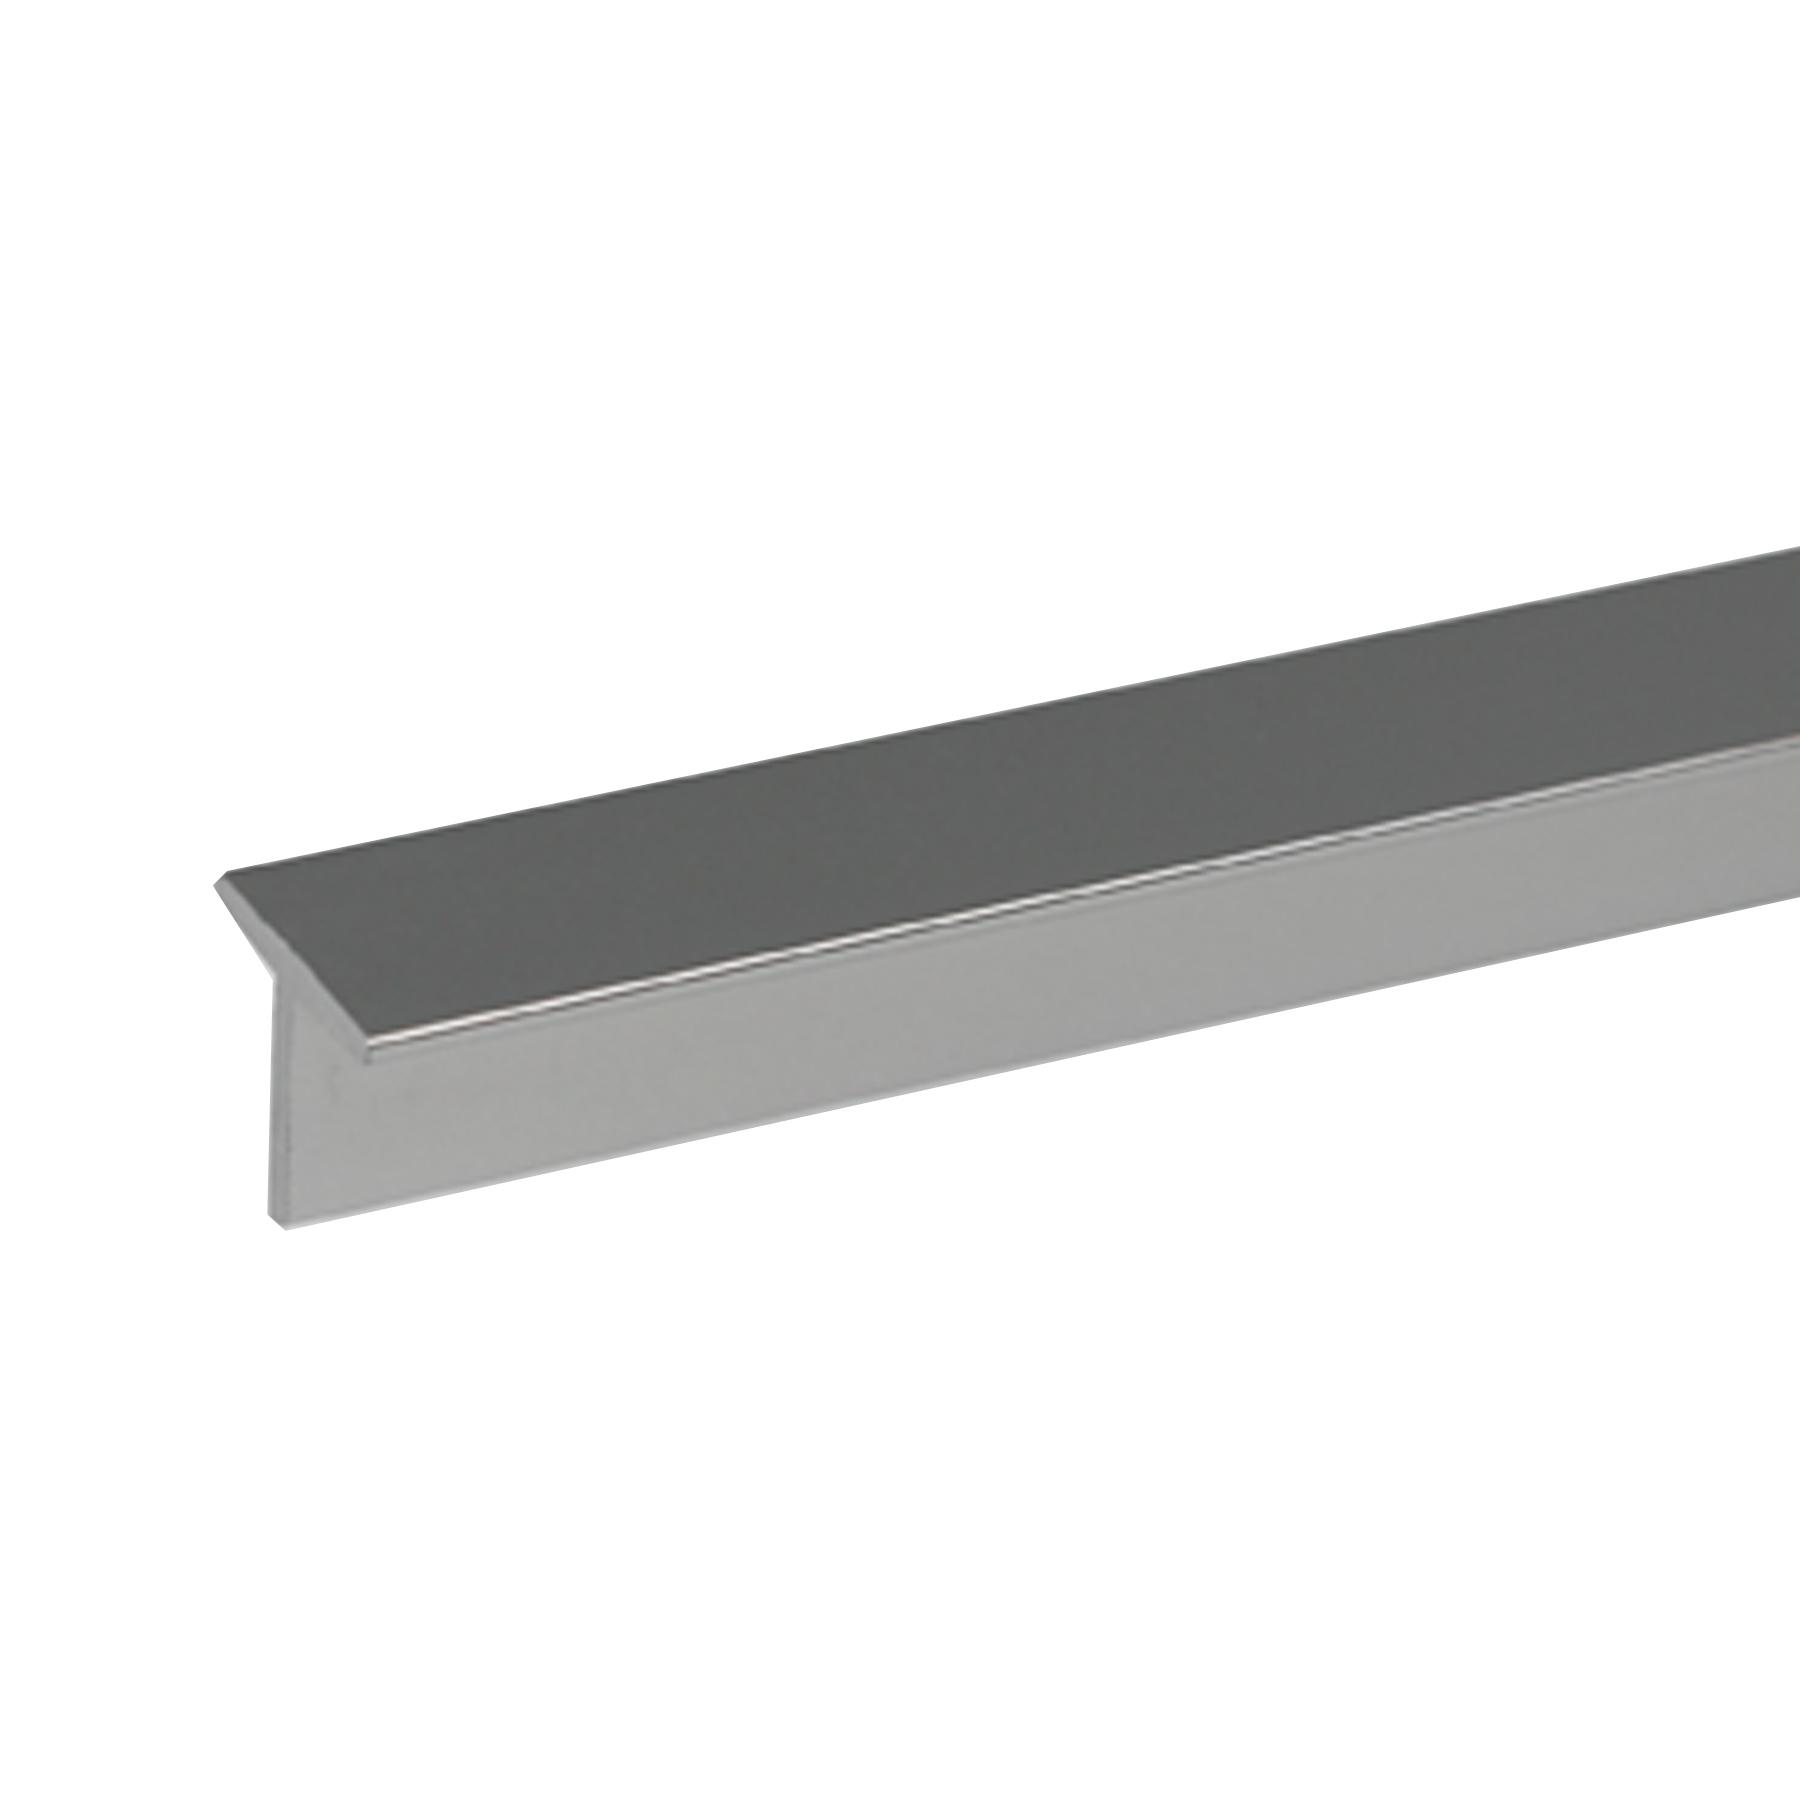 Perfil T Alumínio 2mx15cm